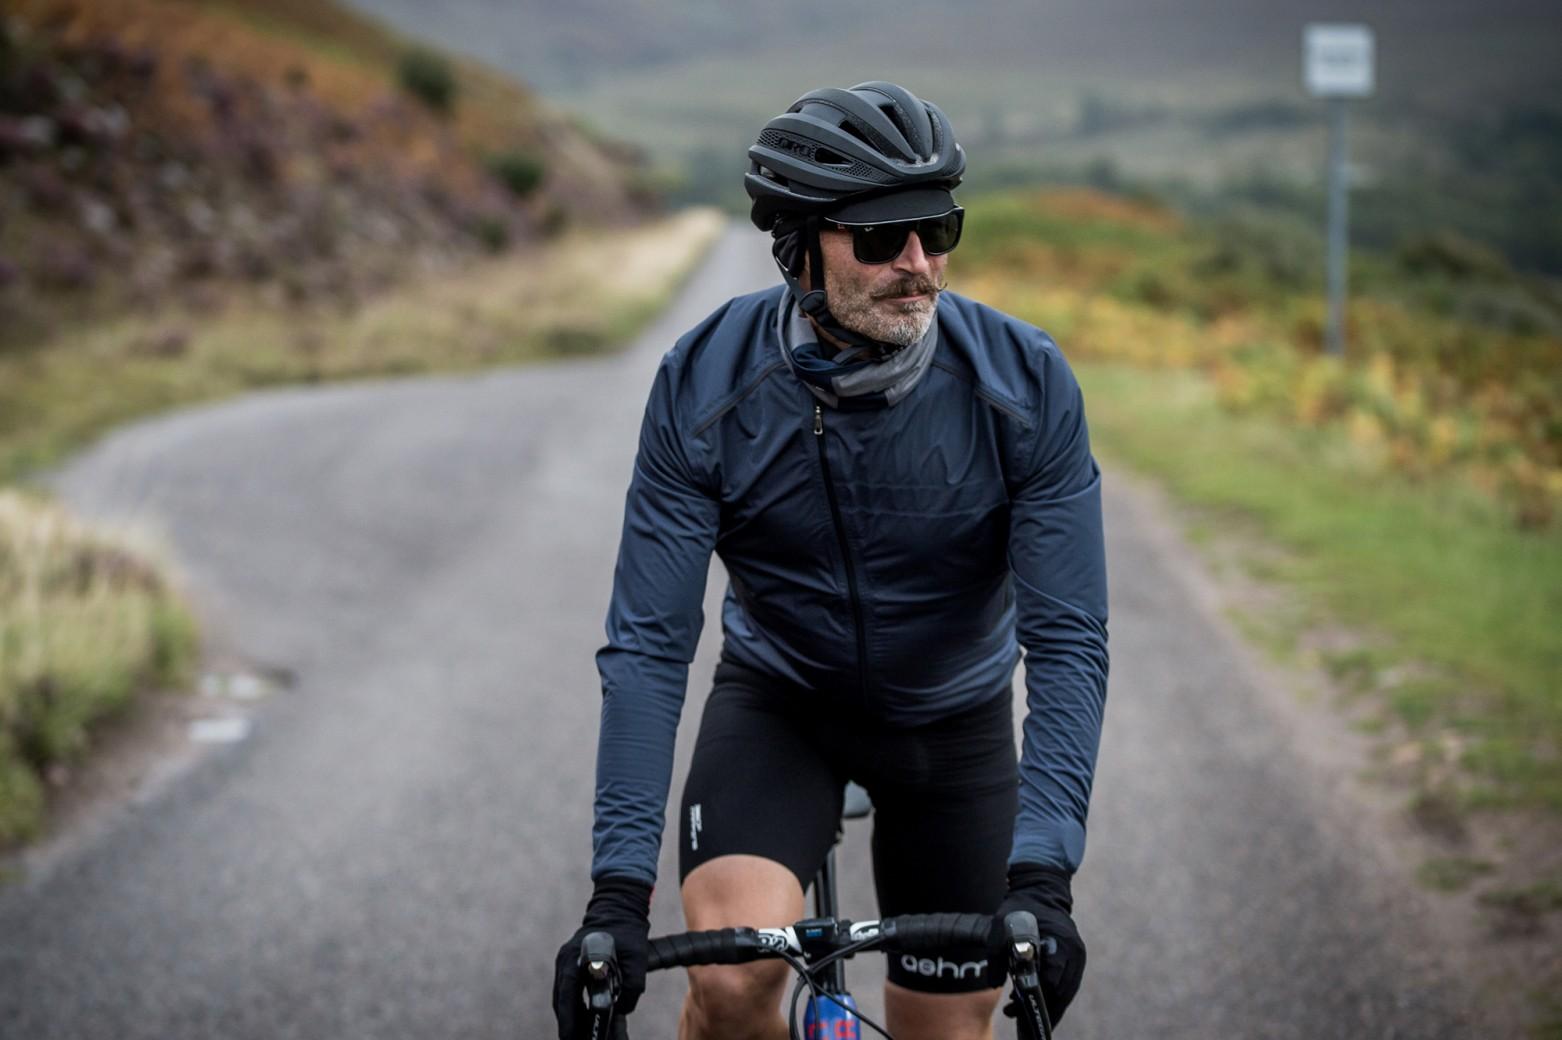 cuidar-prenda-impermeable-ciclismo/